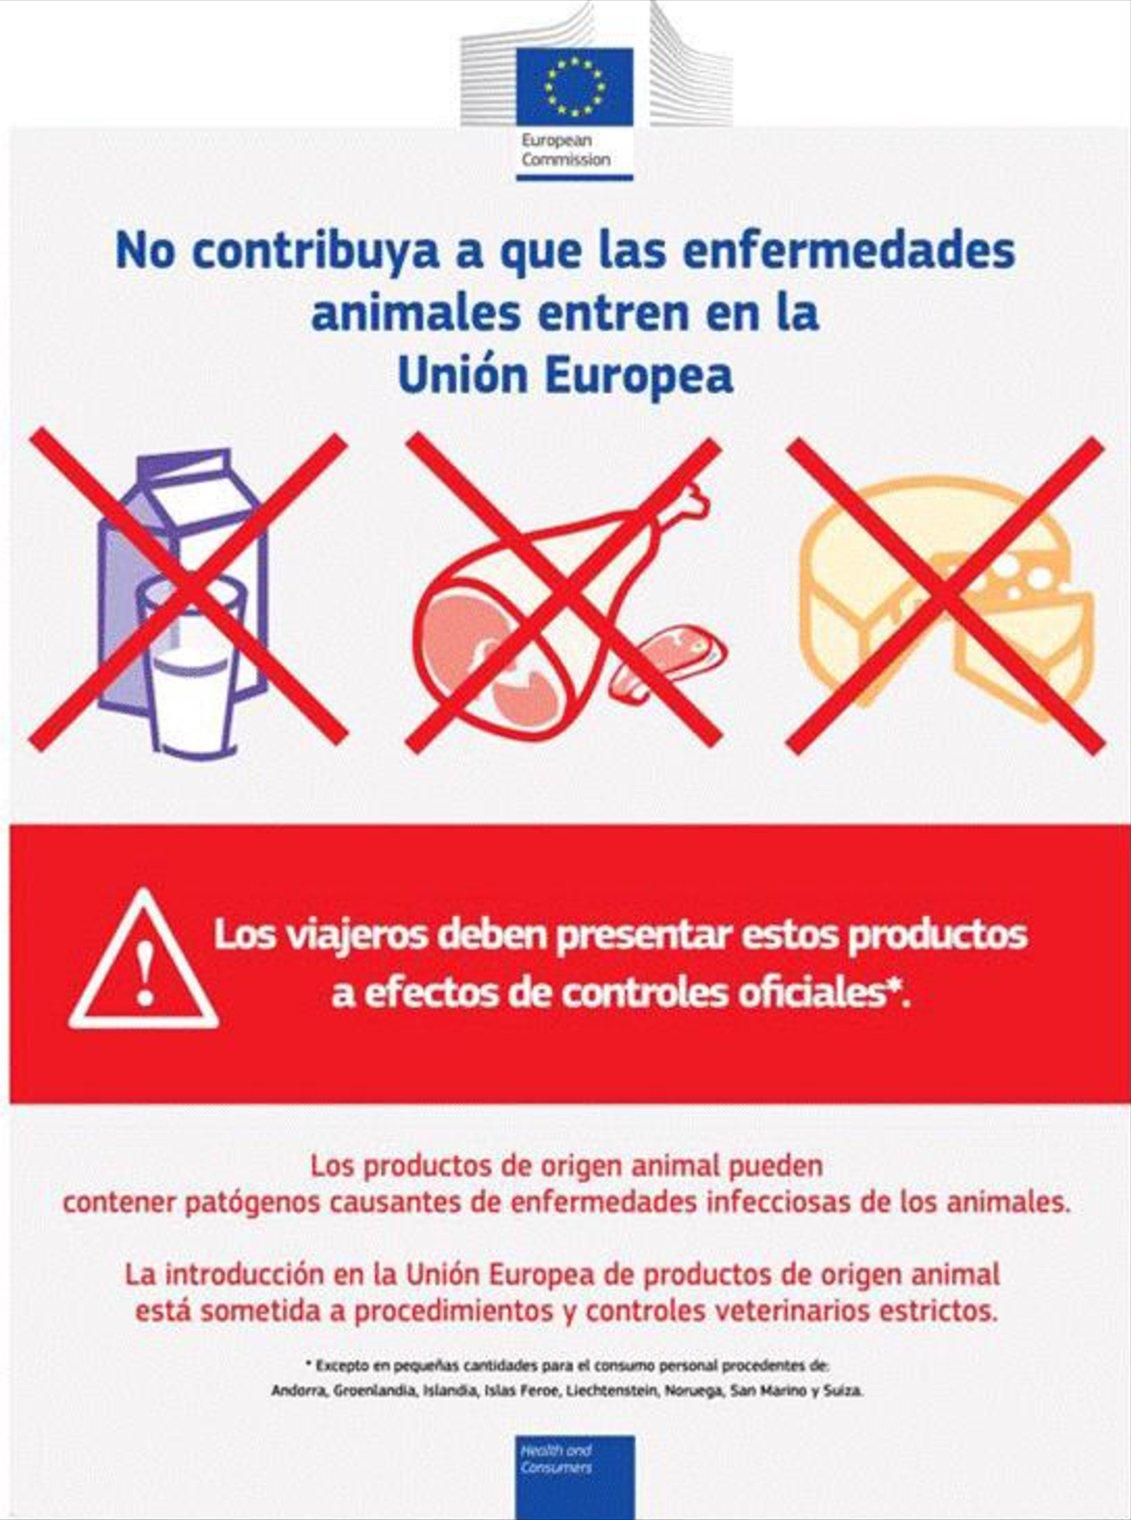 Imagen: https://eur-lex.europa.eu/resource.html?uri=uriserv:OJ.L_.2019.321.01.0045.01.SPA.xhtml.L_2019321ES.01005501.tif.jpg